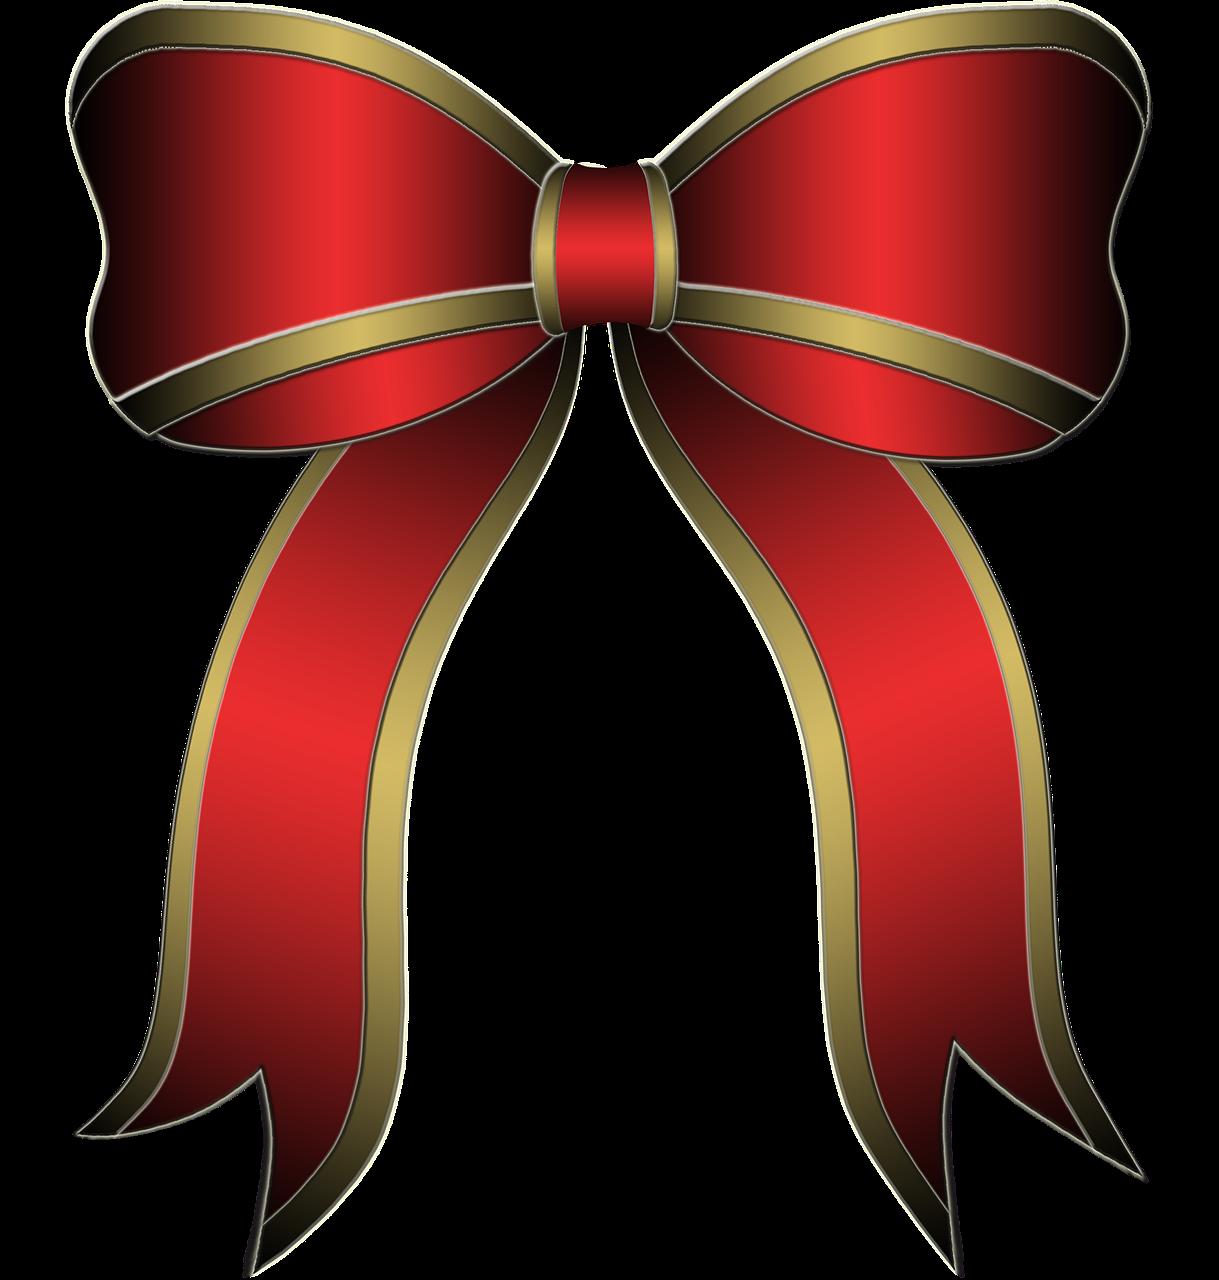 Vacation Red Bow Holiday Bow Bow Gift Ribbon Season Vacation Red Bow Holiday Bow Bow Gift Ribbon Season Holiday Bows Gift Ribbon Red Bow